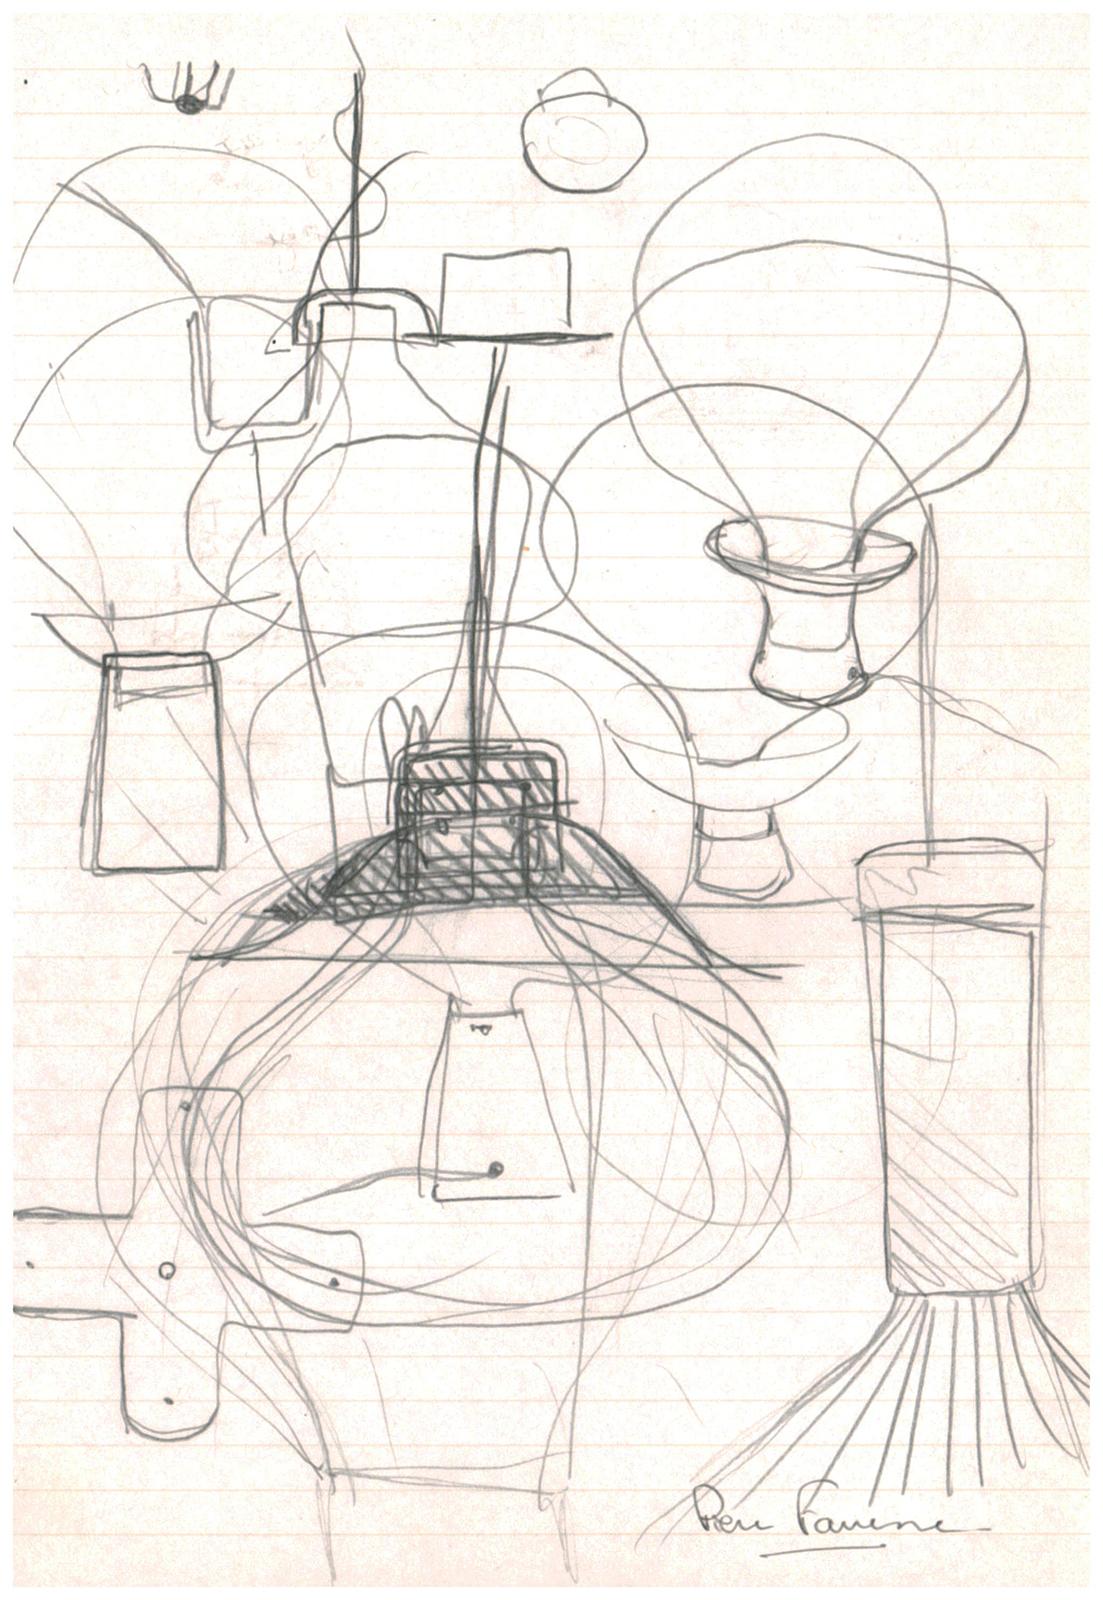 Pierre Favresse - Drawing - Work - Designer - Design - Preparatory sketch n°6